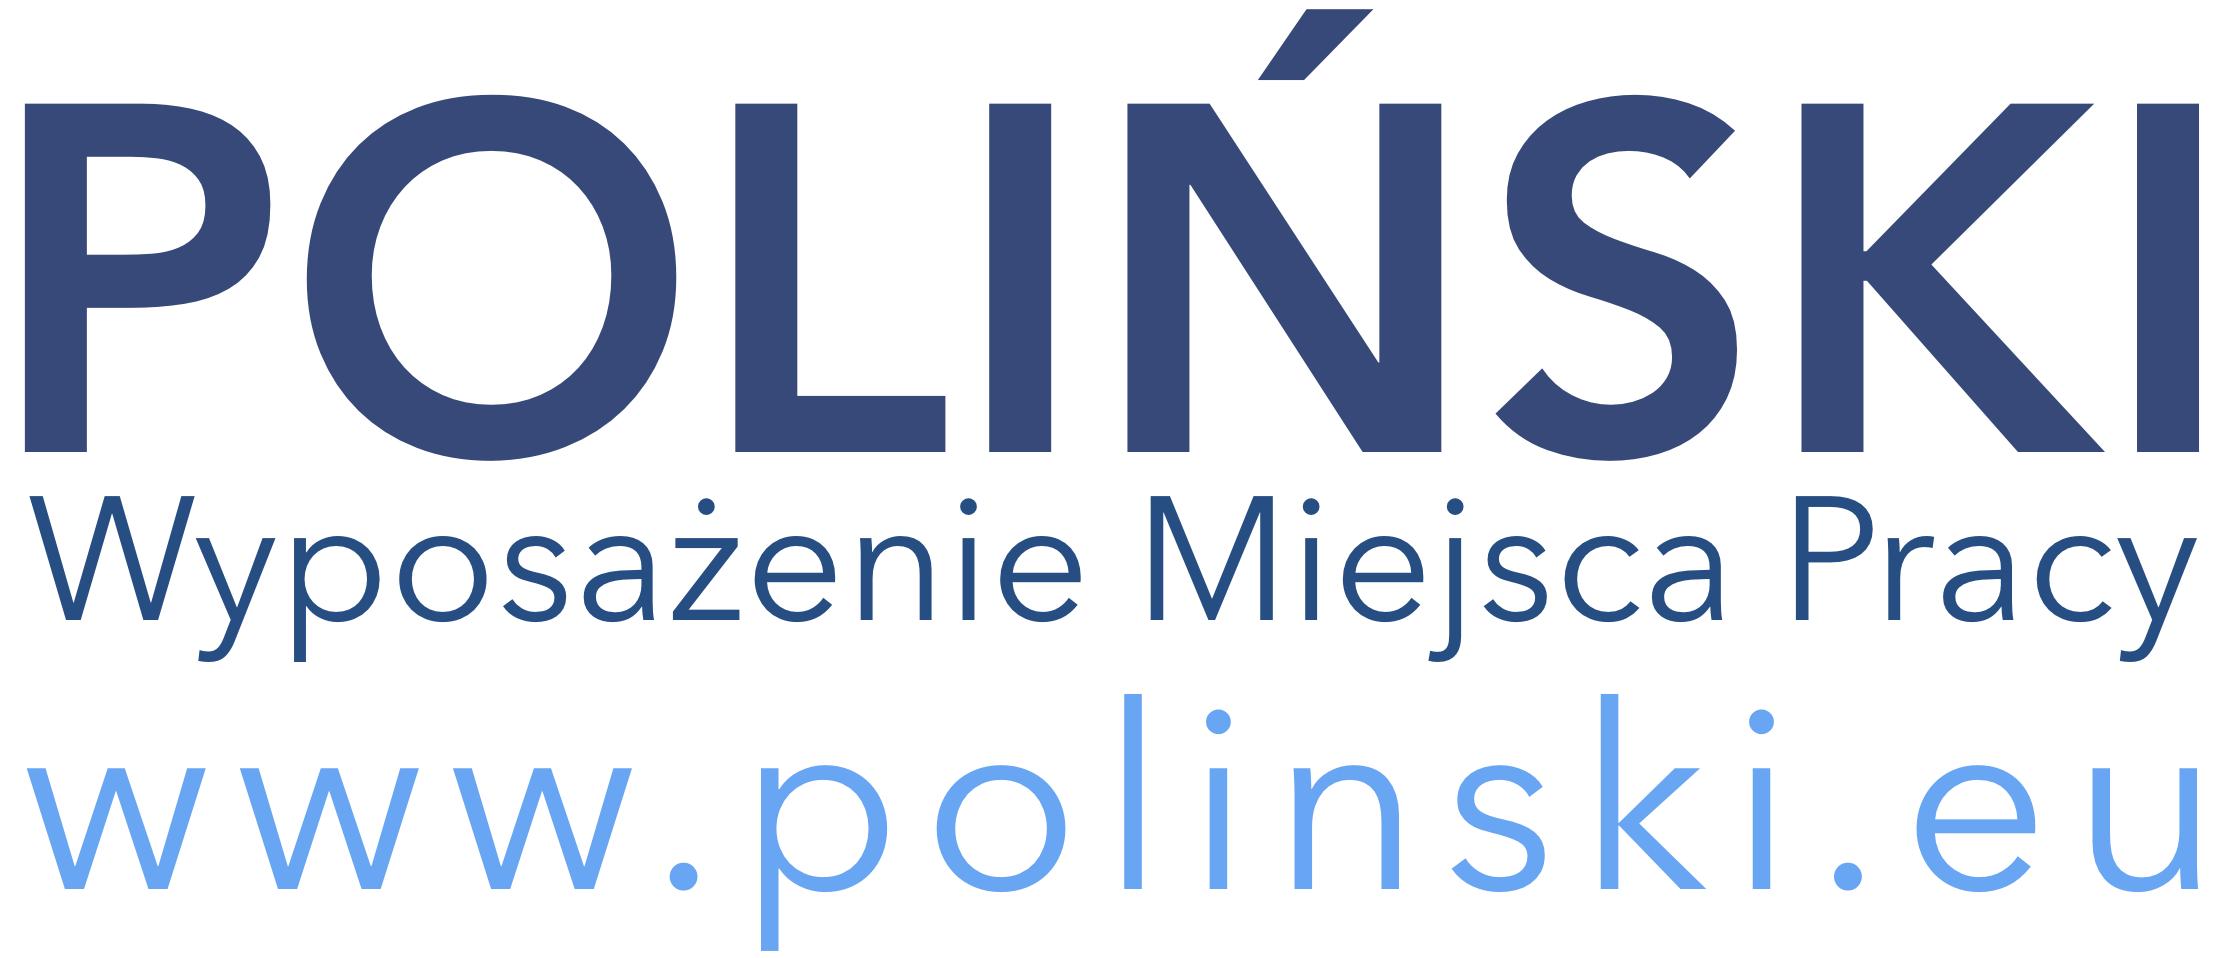 Poliński logo